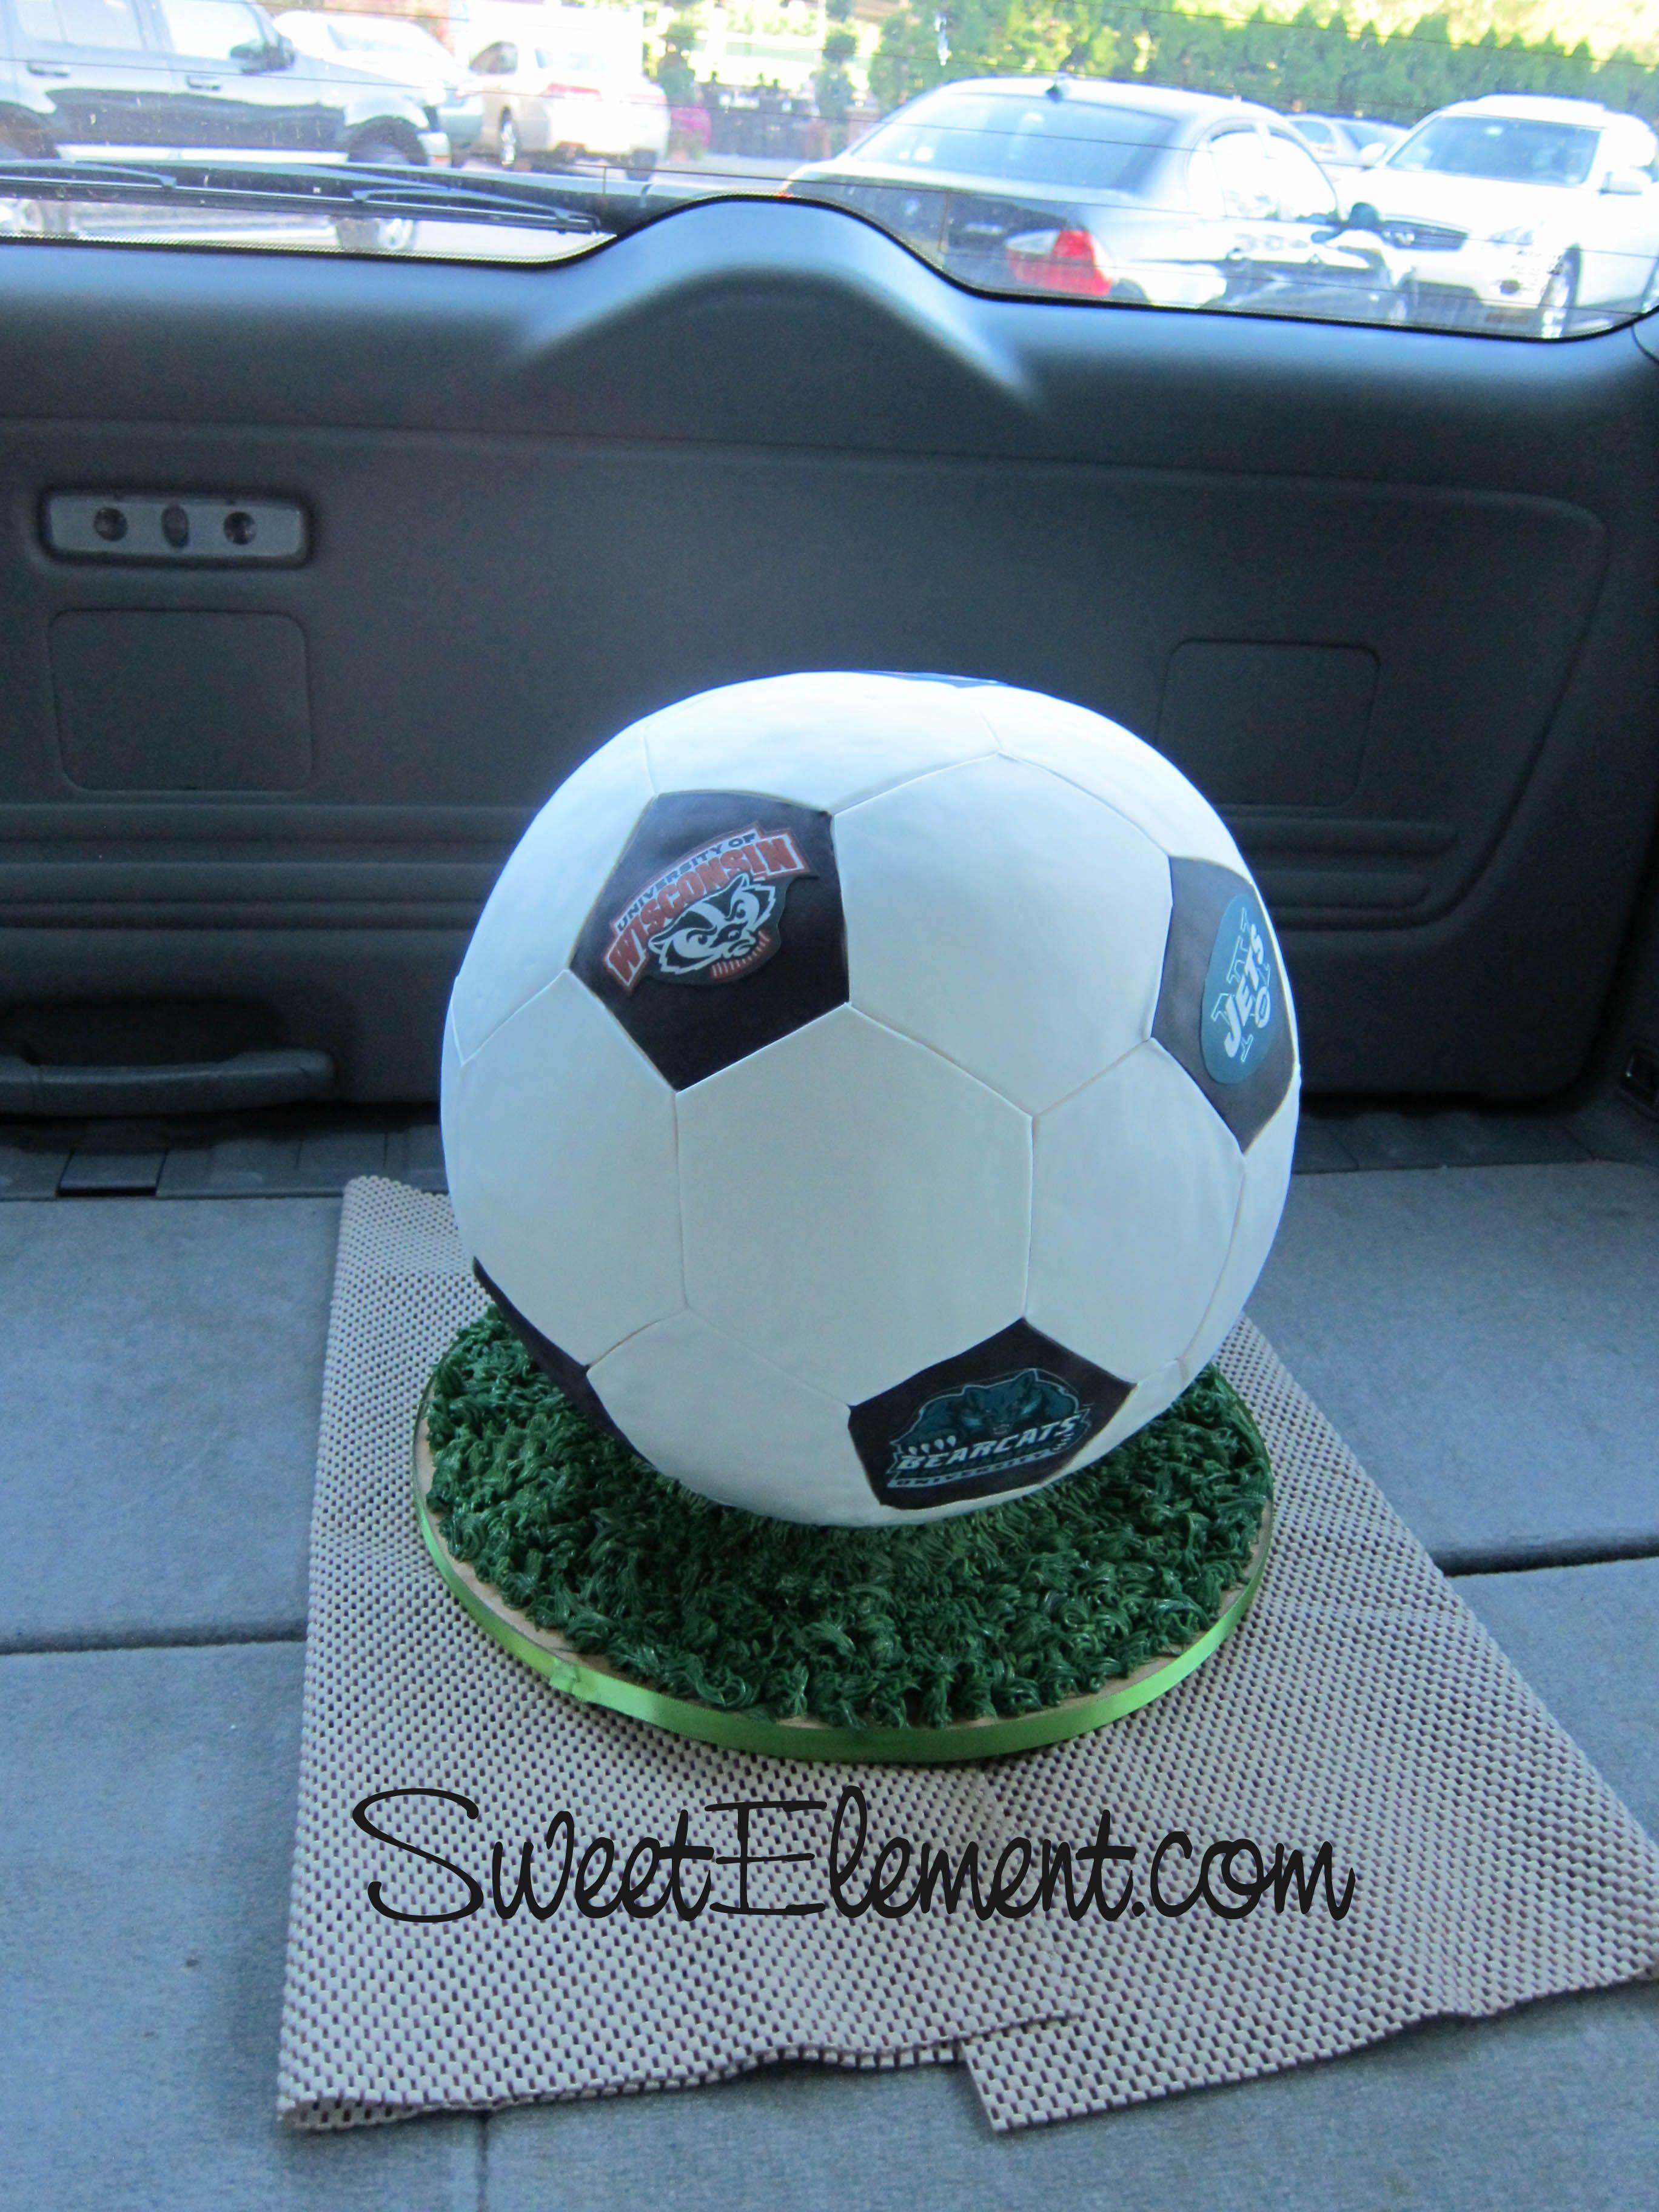 Google Image Result for http://sweetelement.files.wordpress.com/2010/09/soccer_ball_grooms_cake_in_the_car.jpg